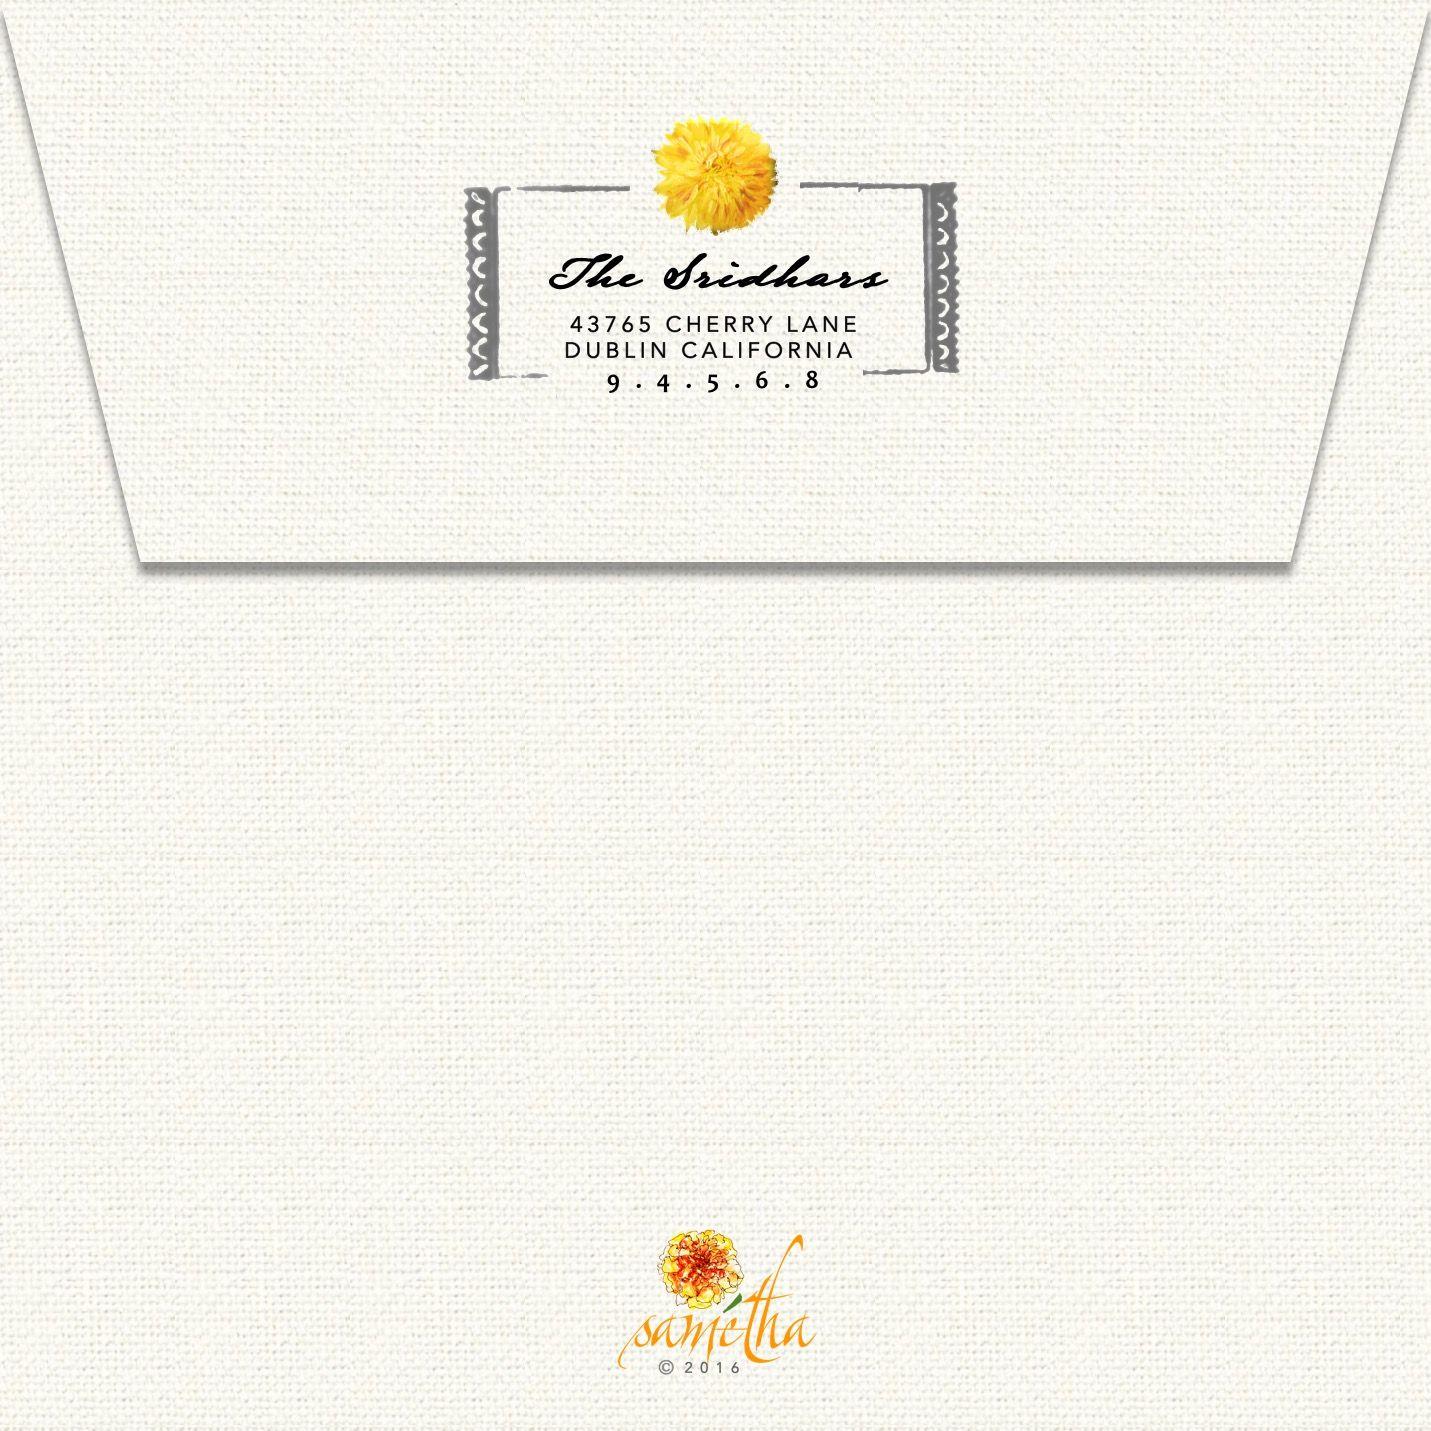 Samétha S South Indian Wedding Invitation Card Envelope Back